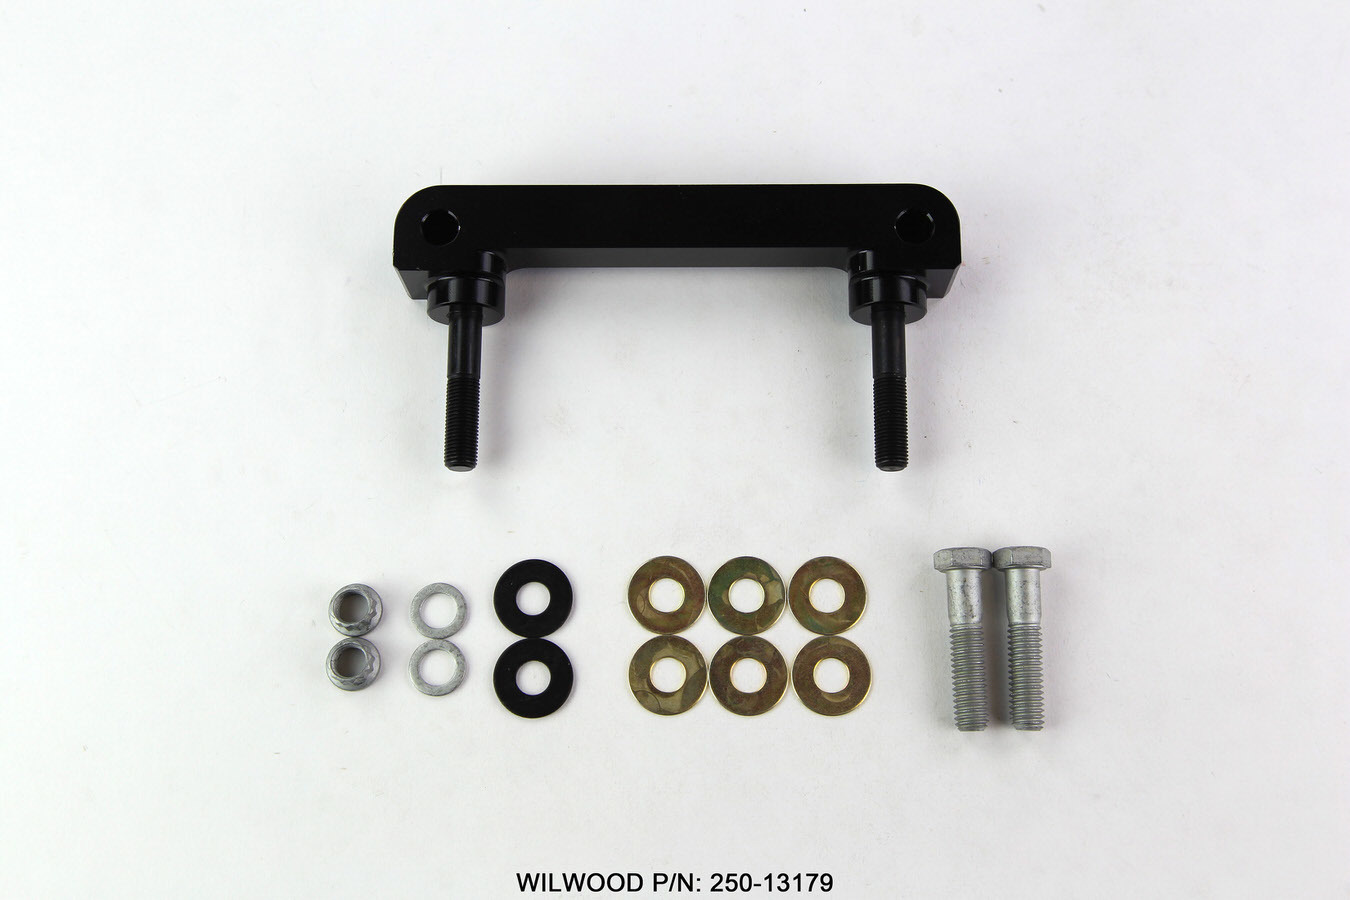 Wilwood 250-13179 Brake Caliper Bracket, 3.50 in Radial Mount, Billet Aluminum, Black Anodized, Billet Dynalite Calipers, Kit